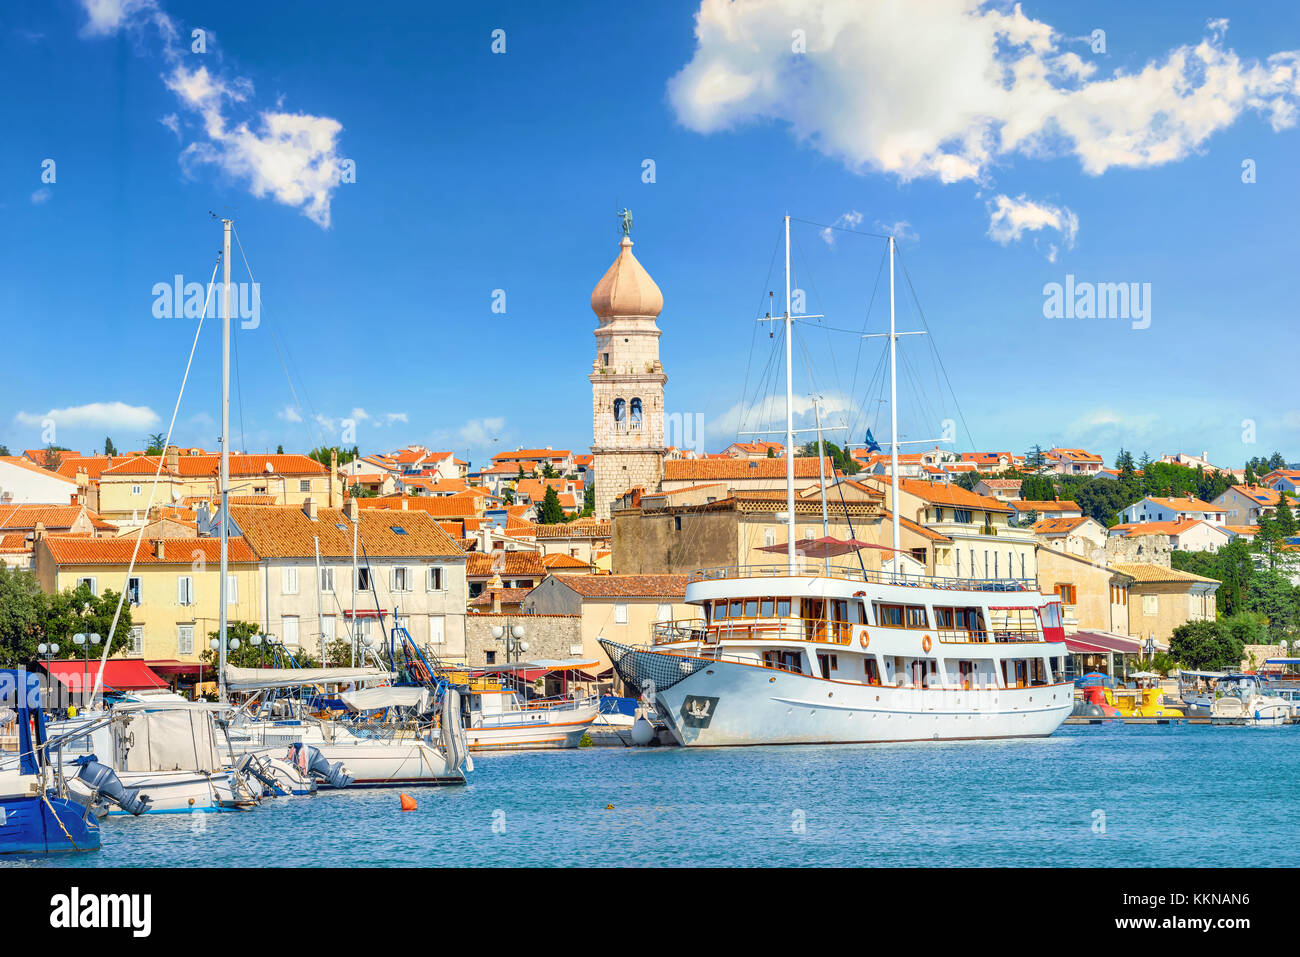 Ansicht der mediterranen Küste Altstadt Krk, Insel Krk, Kroatien Stockbild